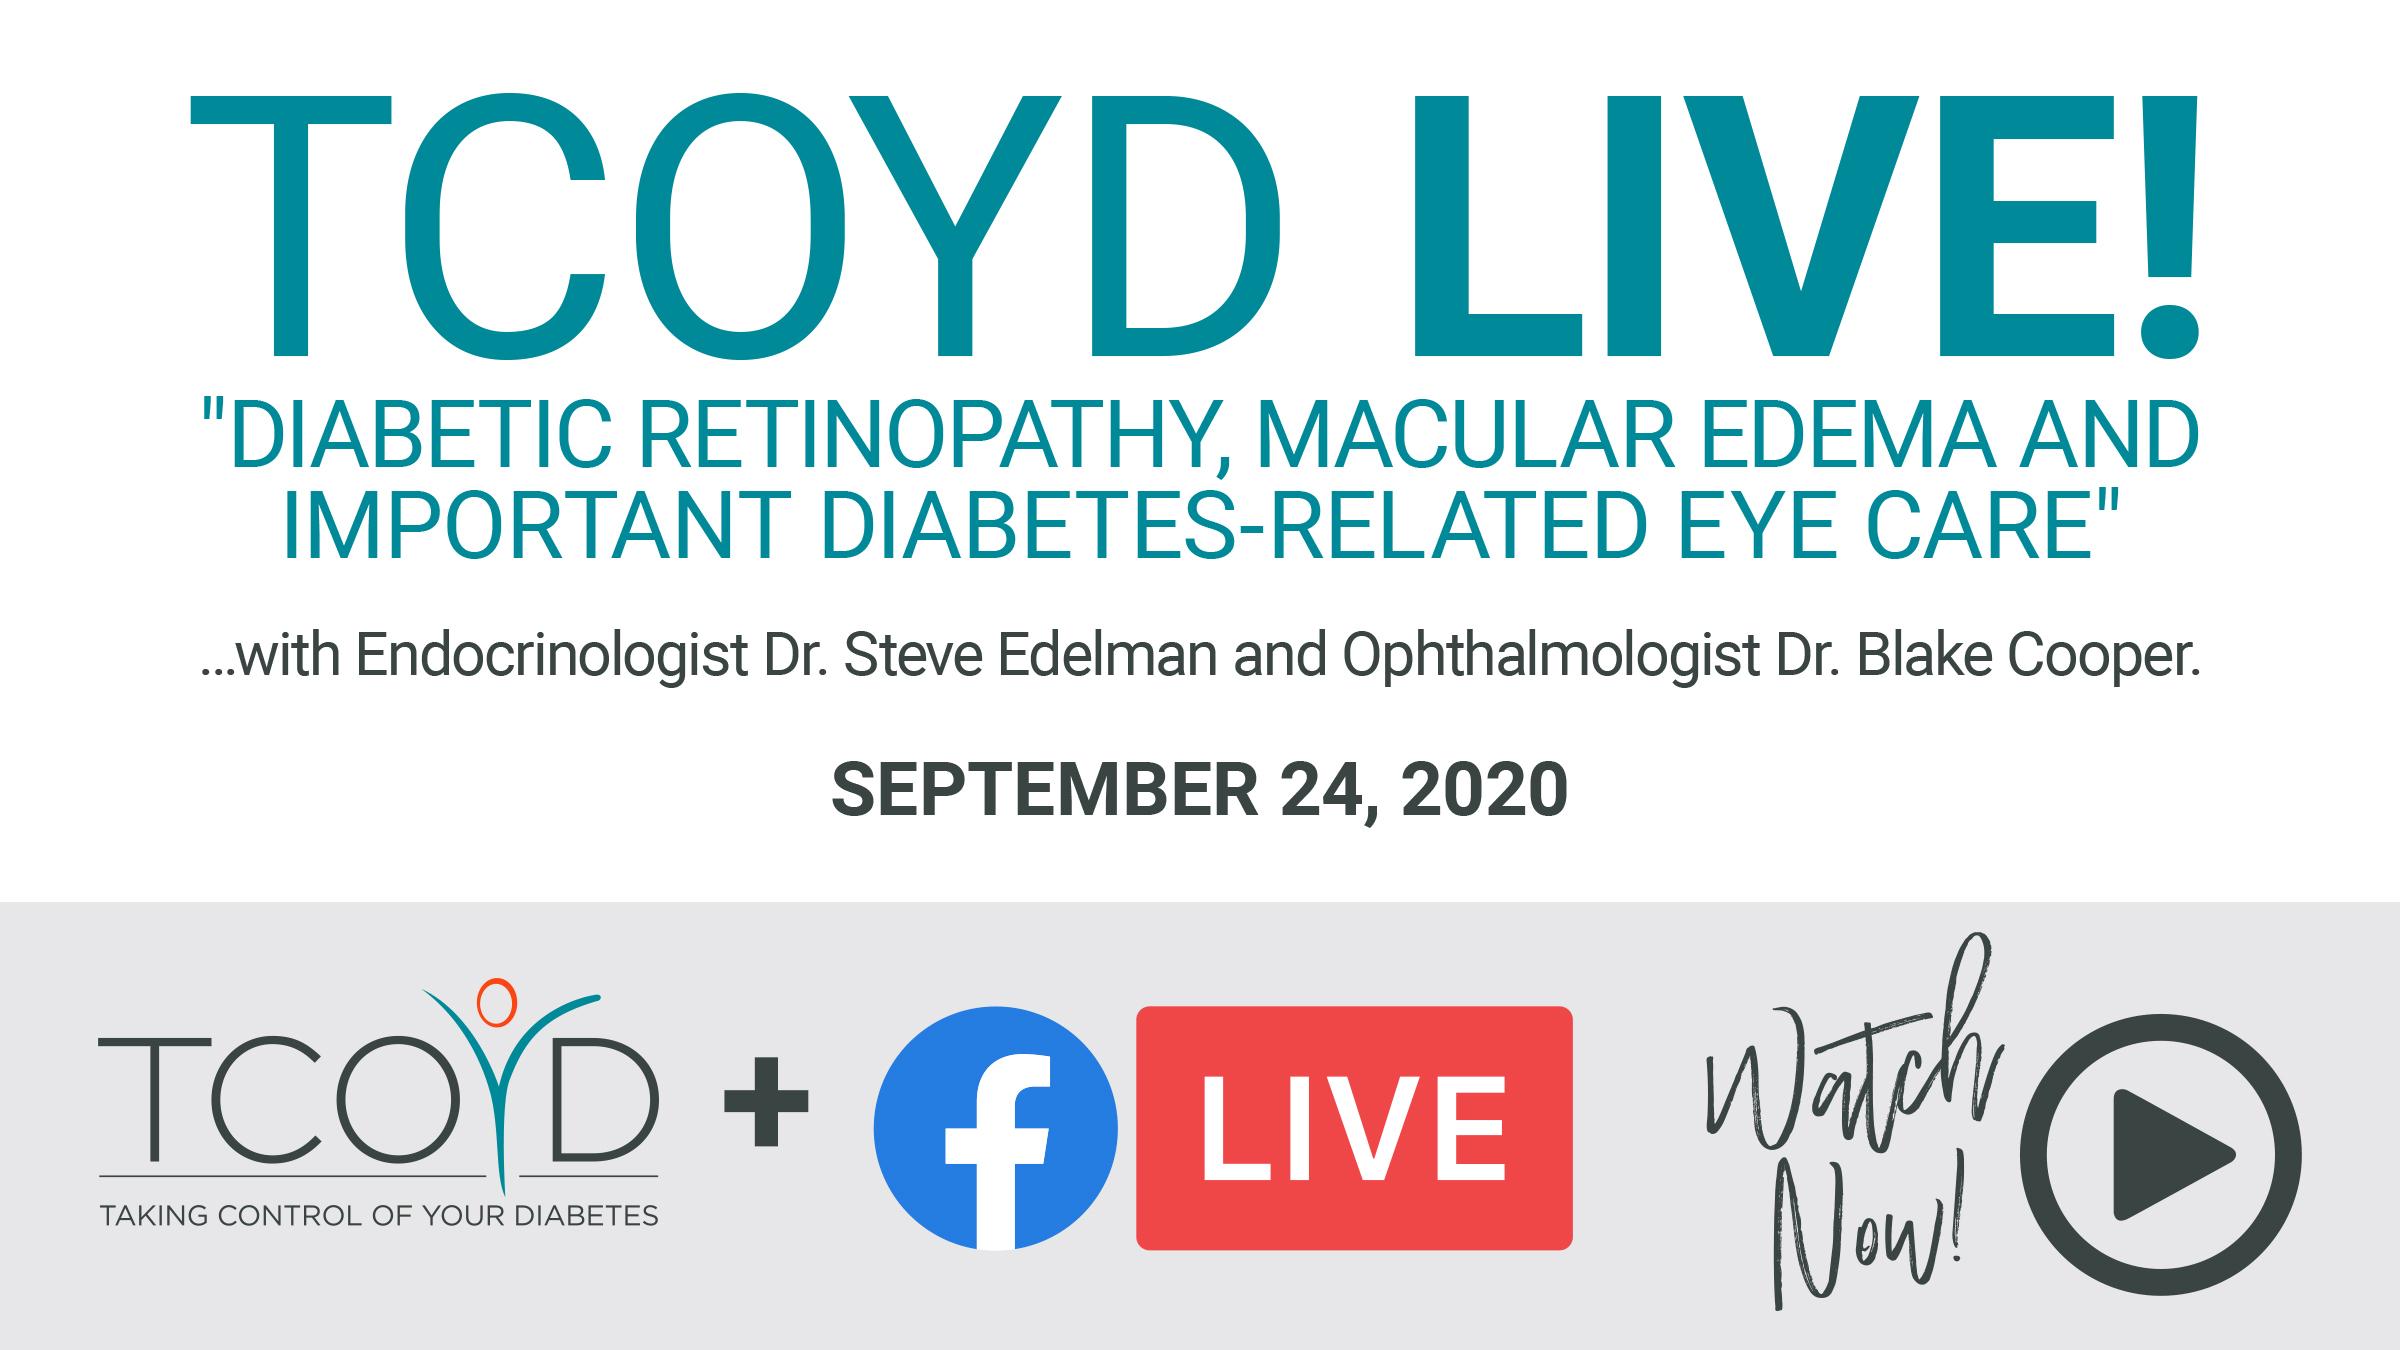 Facebook Live: Diabetic Retinopathy, Macular Edema & Diabetes-Related Eye Care